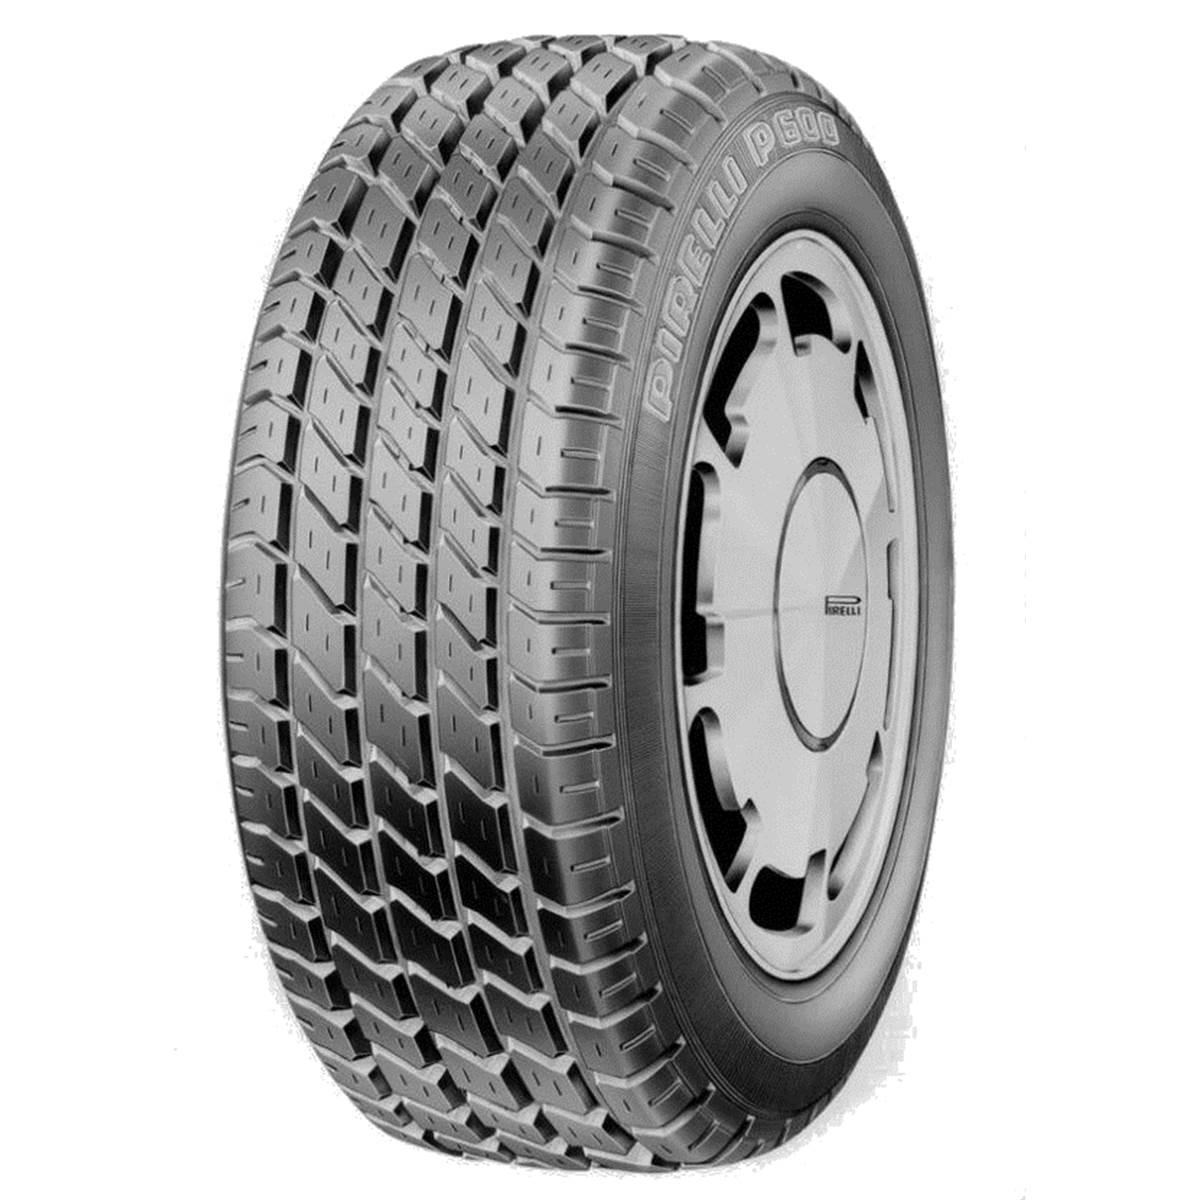 Pneu Pirelli 235/60R15 98W P600